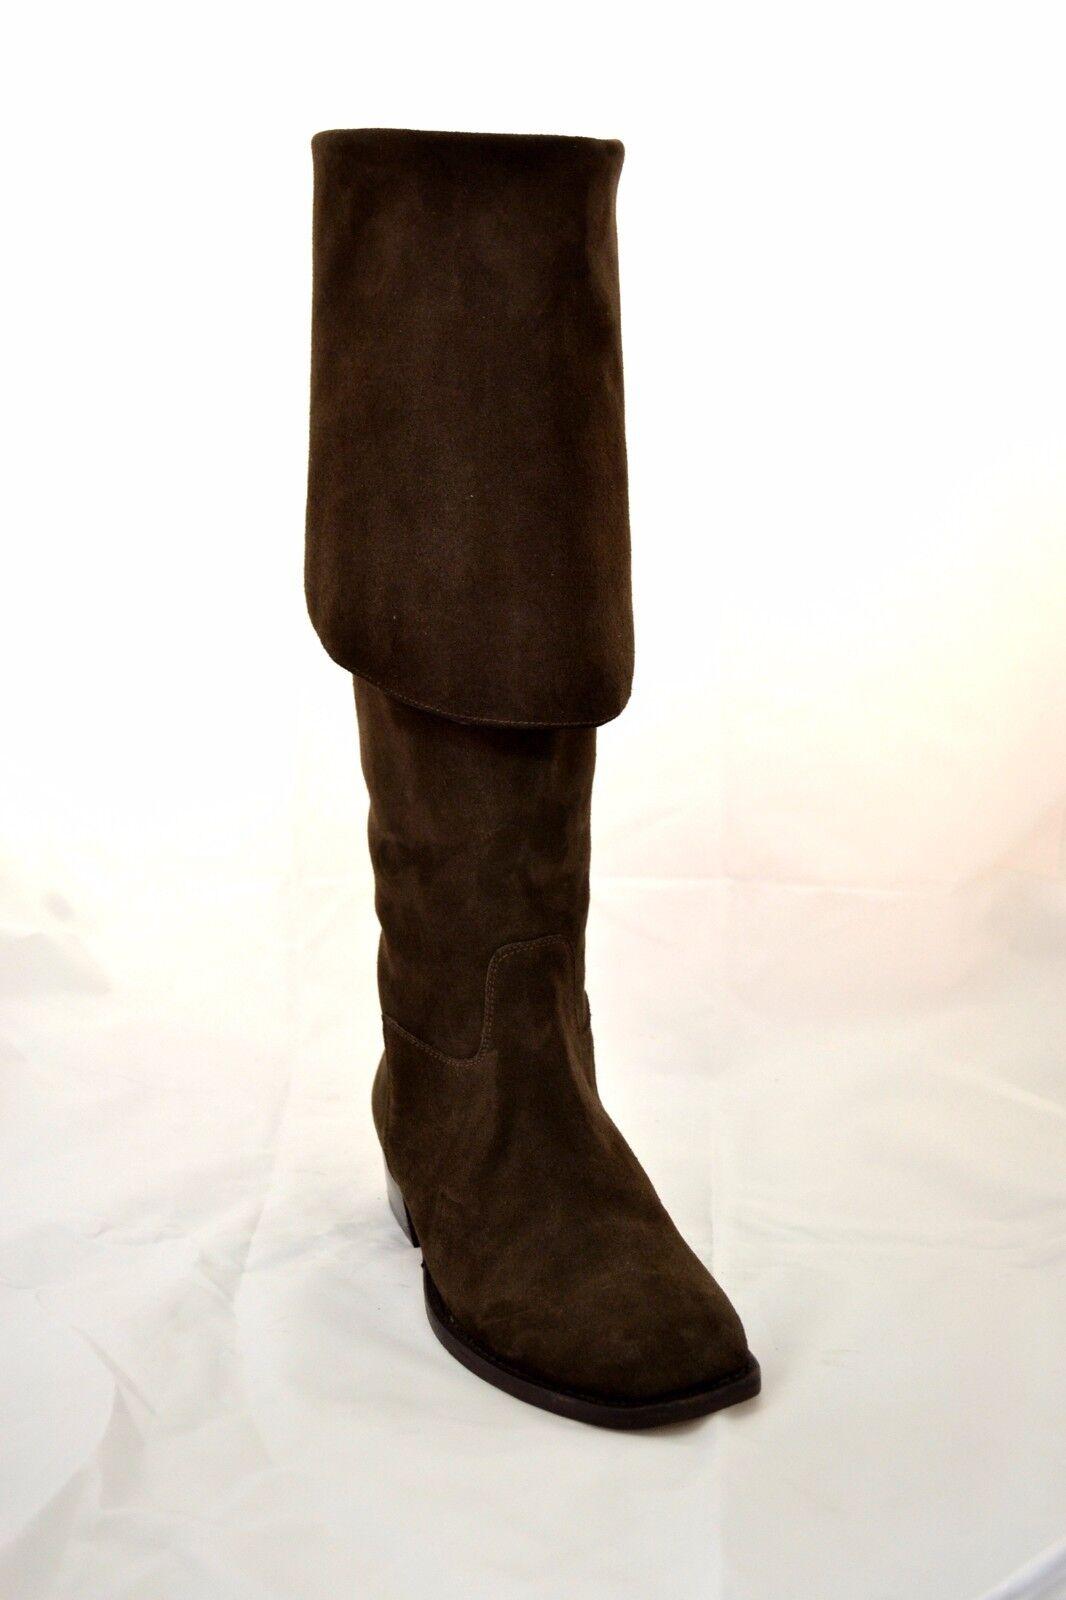 Scarpe casual da uomo  SPARROW STIVALI PIRATA JACK SPARROW  PIRATI DEI CARAIBI COSPLAY DMTNT PIRATES BOOTS POTC 8be8a6